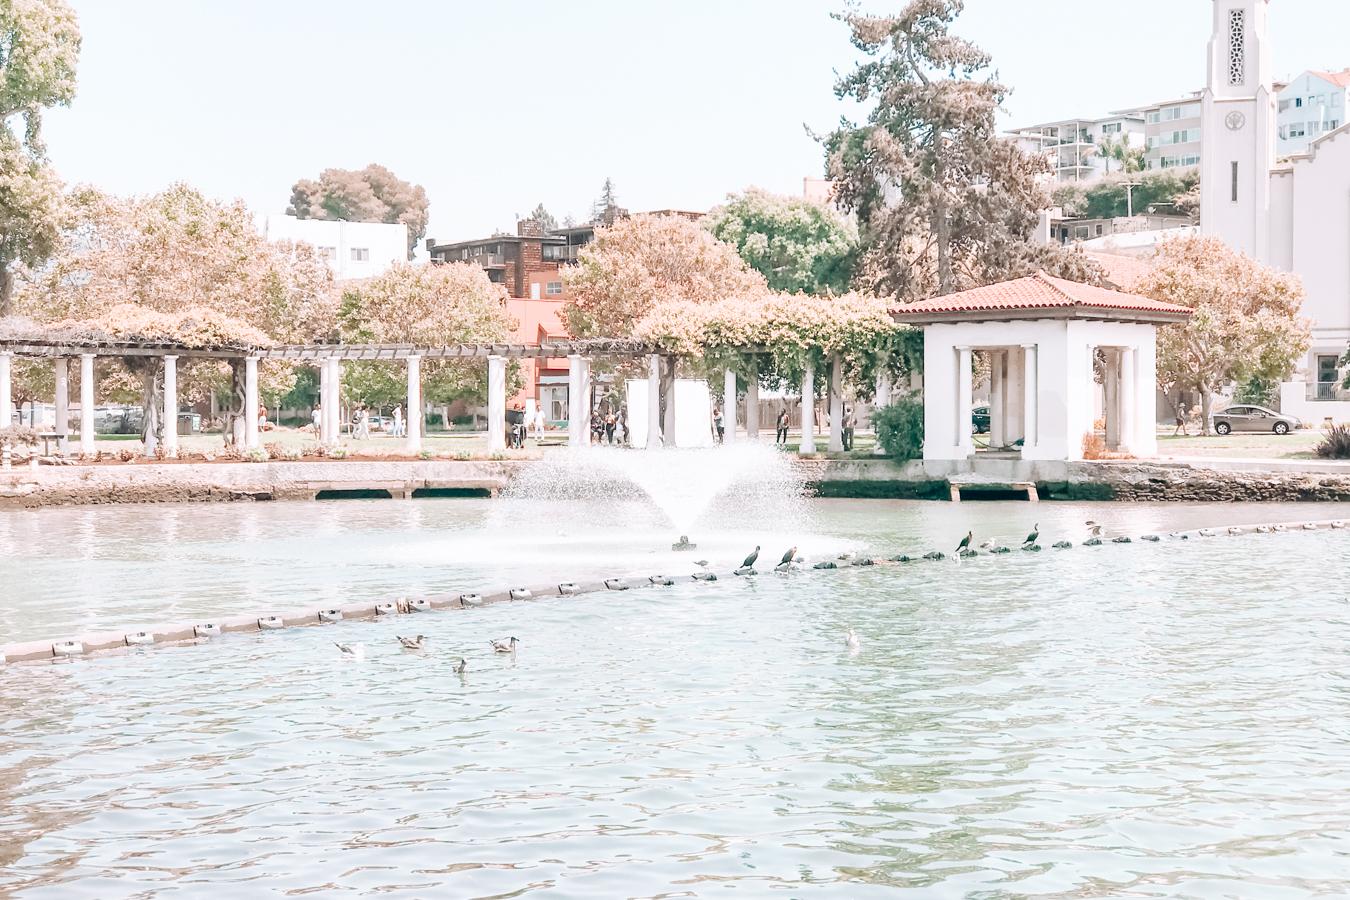 Lakeside Park in Oakland